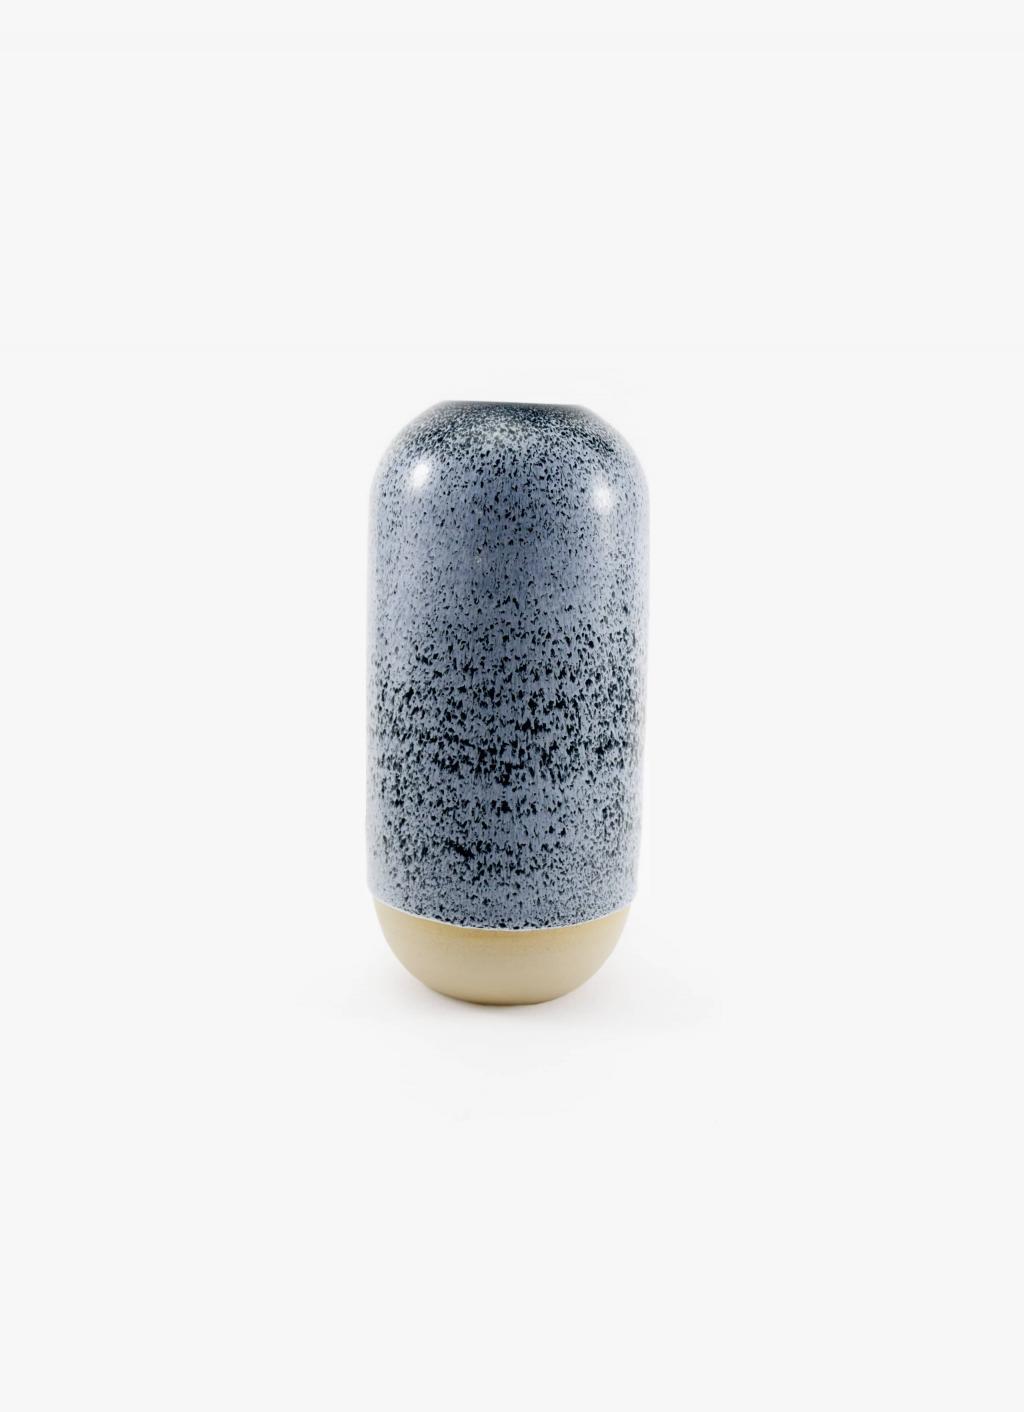 Studio Arhoj - Yuki Vase Speckled Black